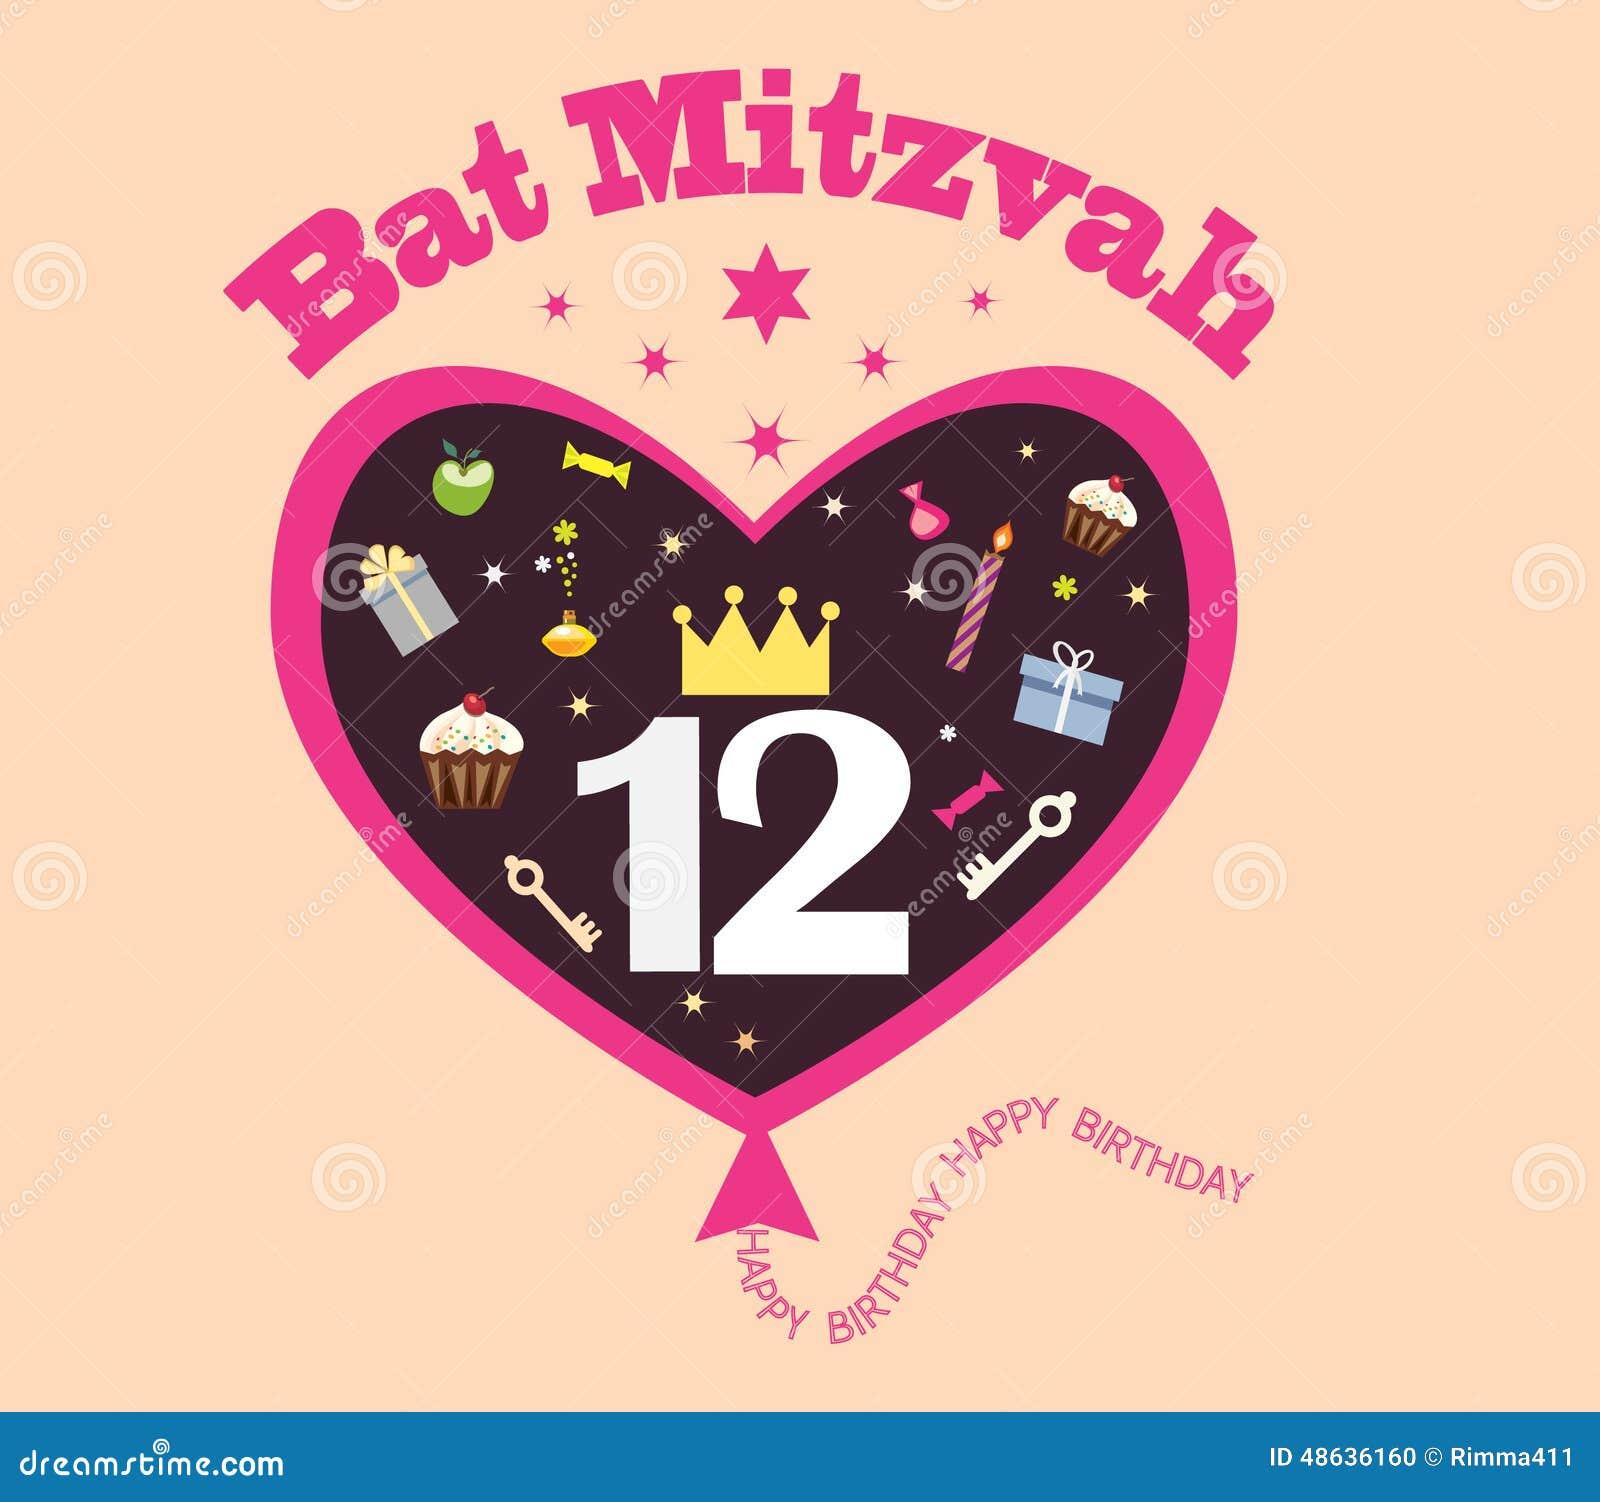 Birthday cards kids birthday cards happy birthday kids cards card - Bat Mitzvah Stock Illustration Image 48636160